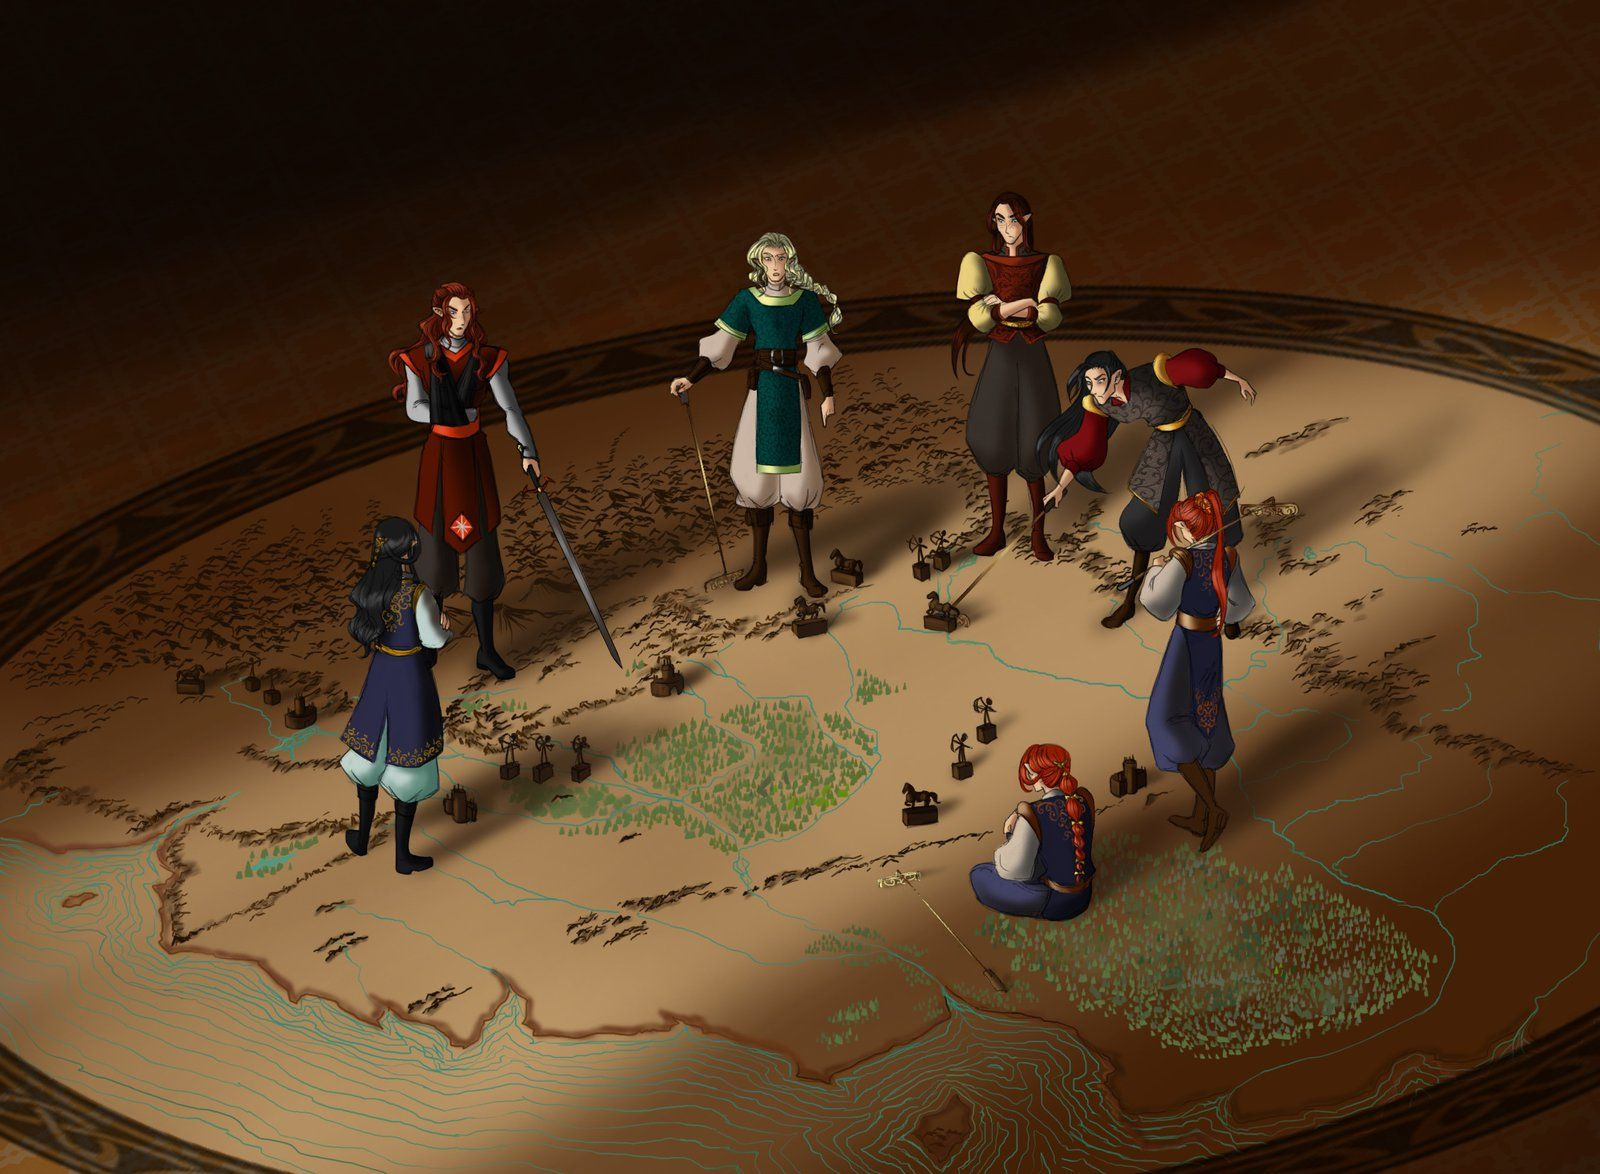 Феаноринги в Химринге обсуждают стратегию битв  war games by greenapplefreak on DeviantArt